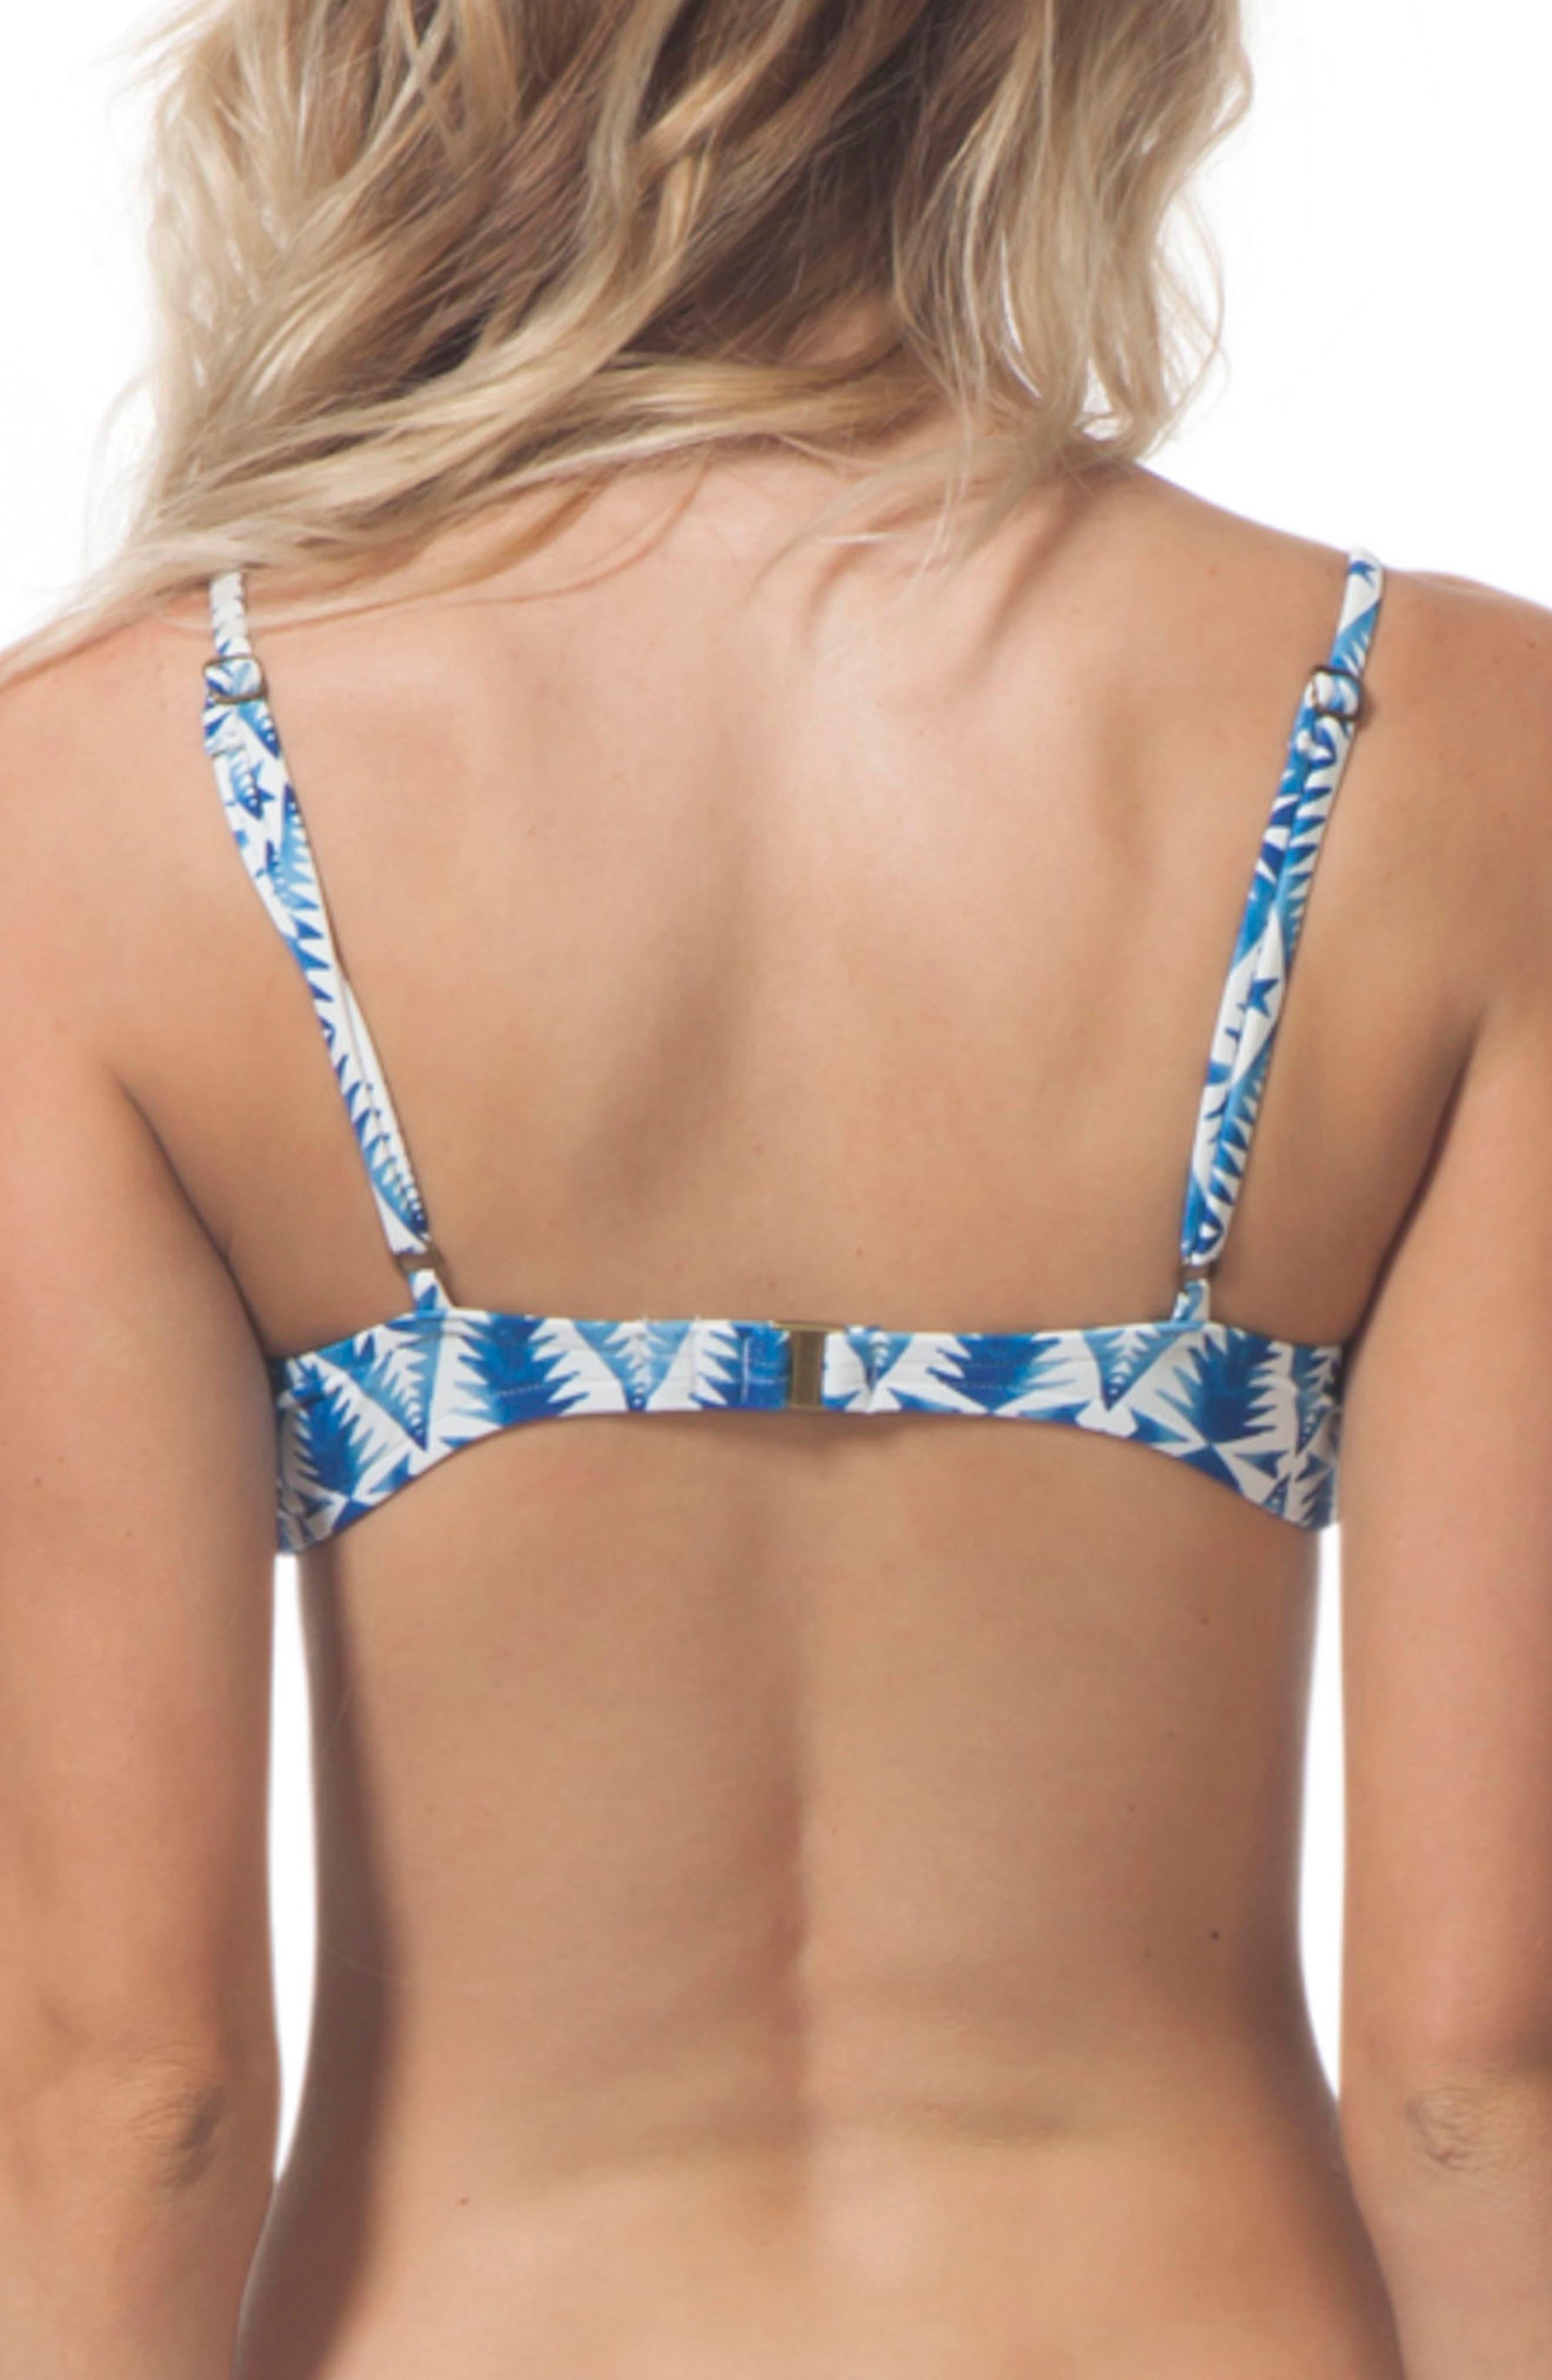 Beach Bazaar Bralette Bikini Top,                             Alternate thumbnail 2, color,                             Blue